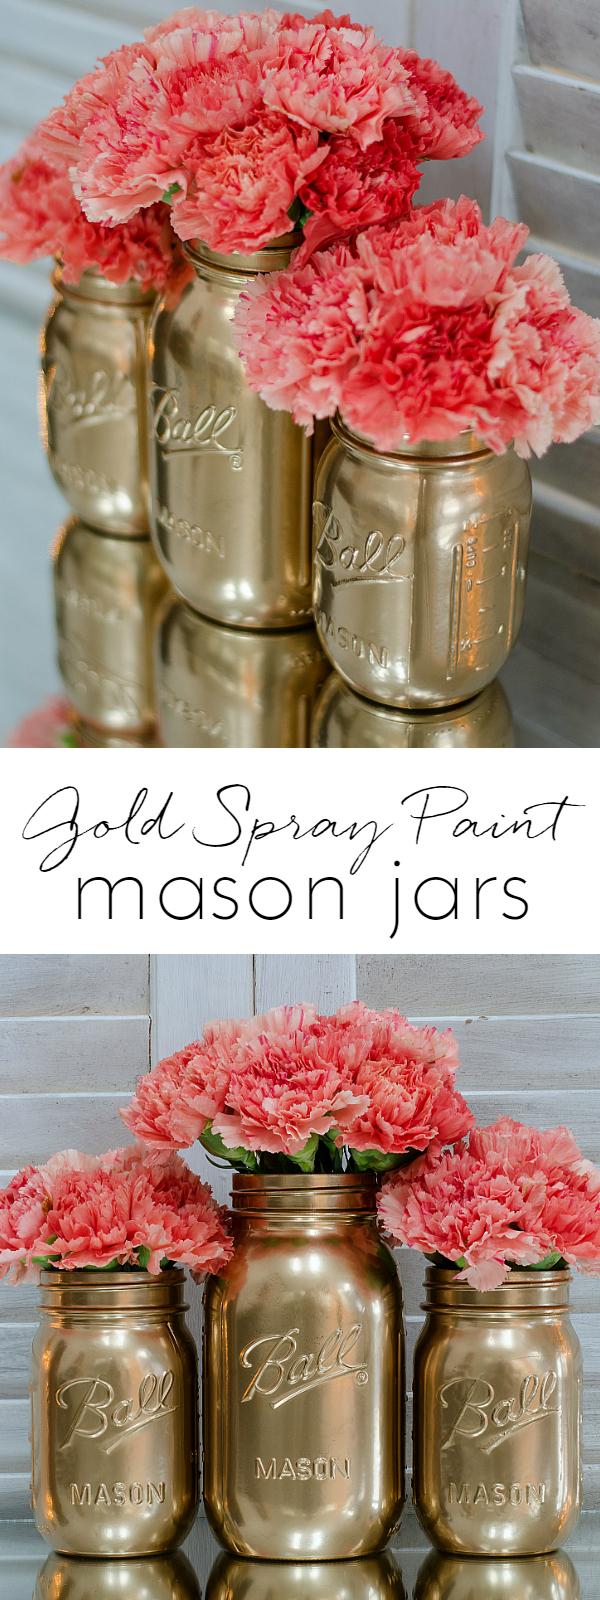 Spray Paint Mason Jars Gold